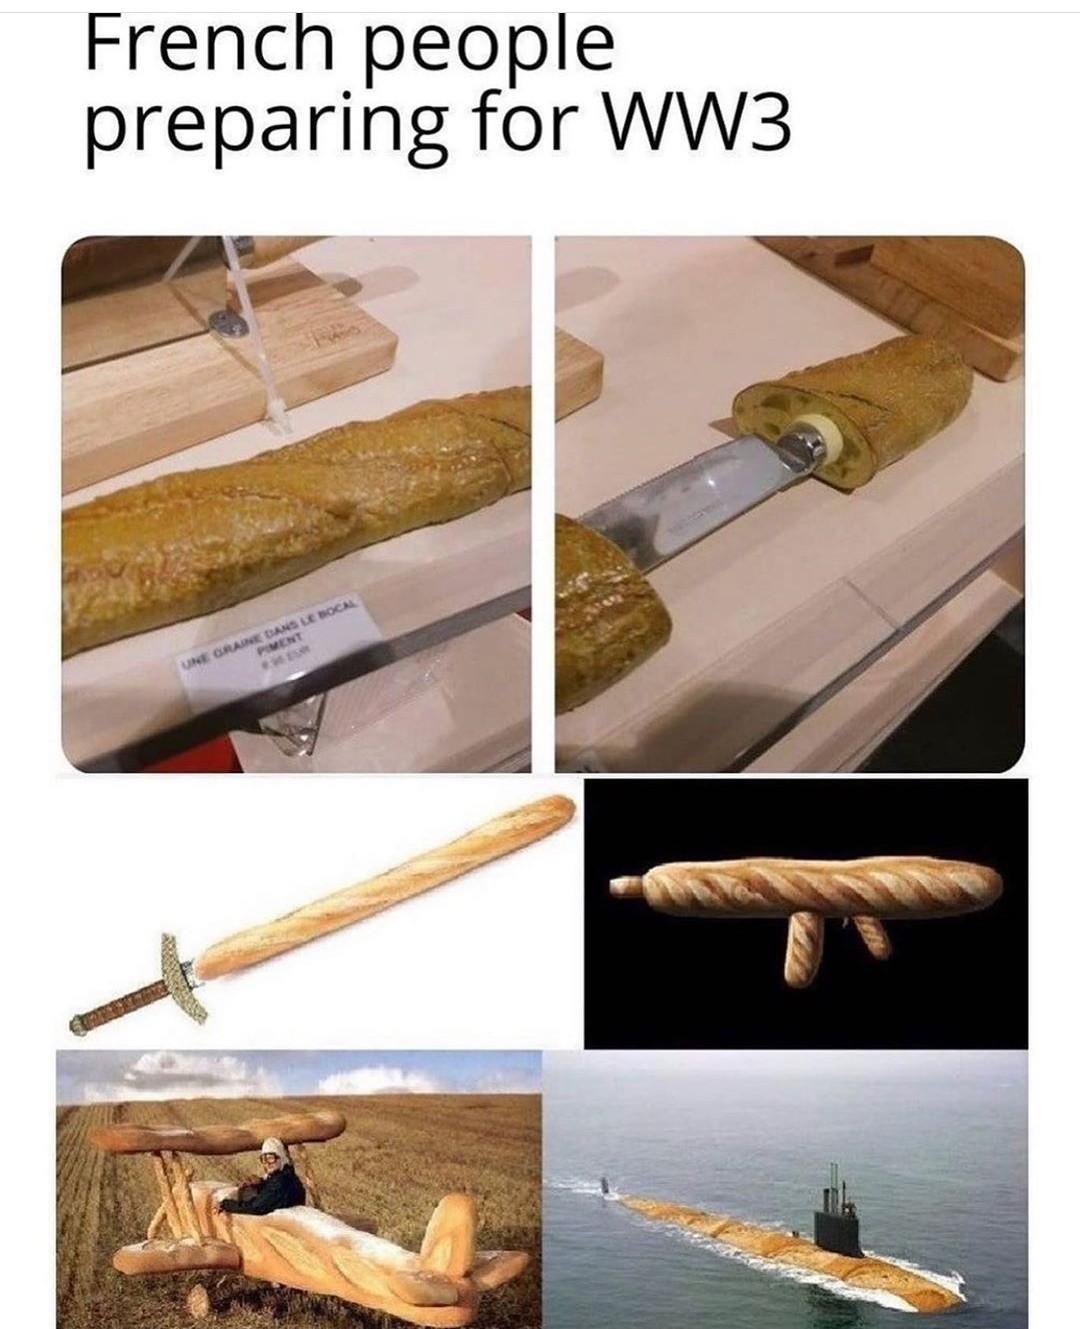 Krkr - meme